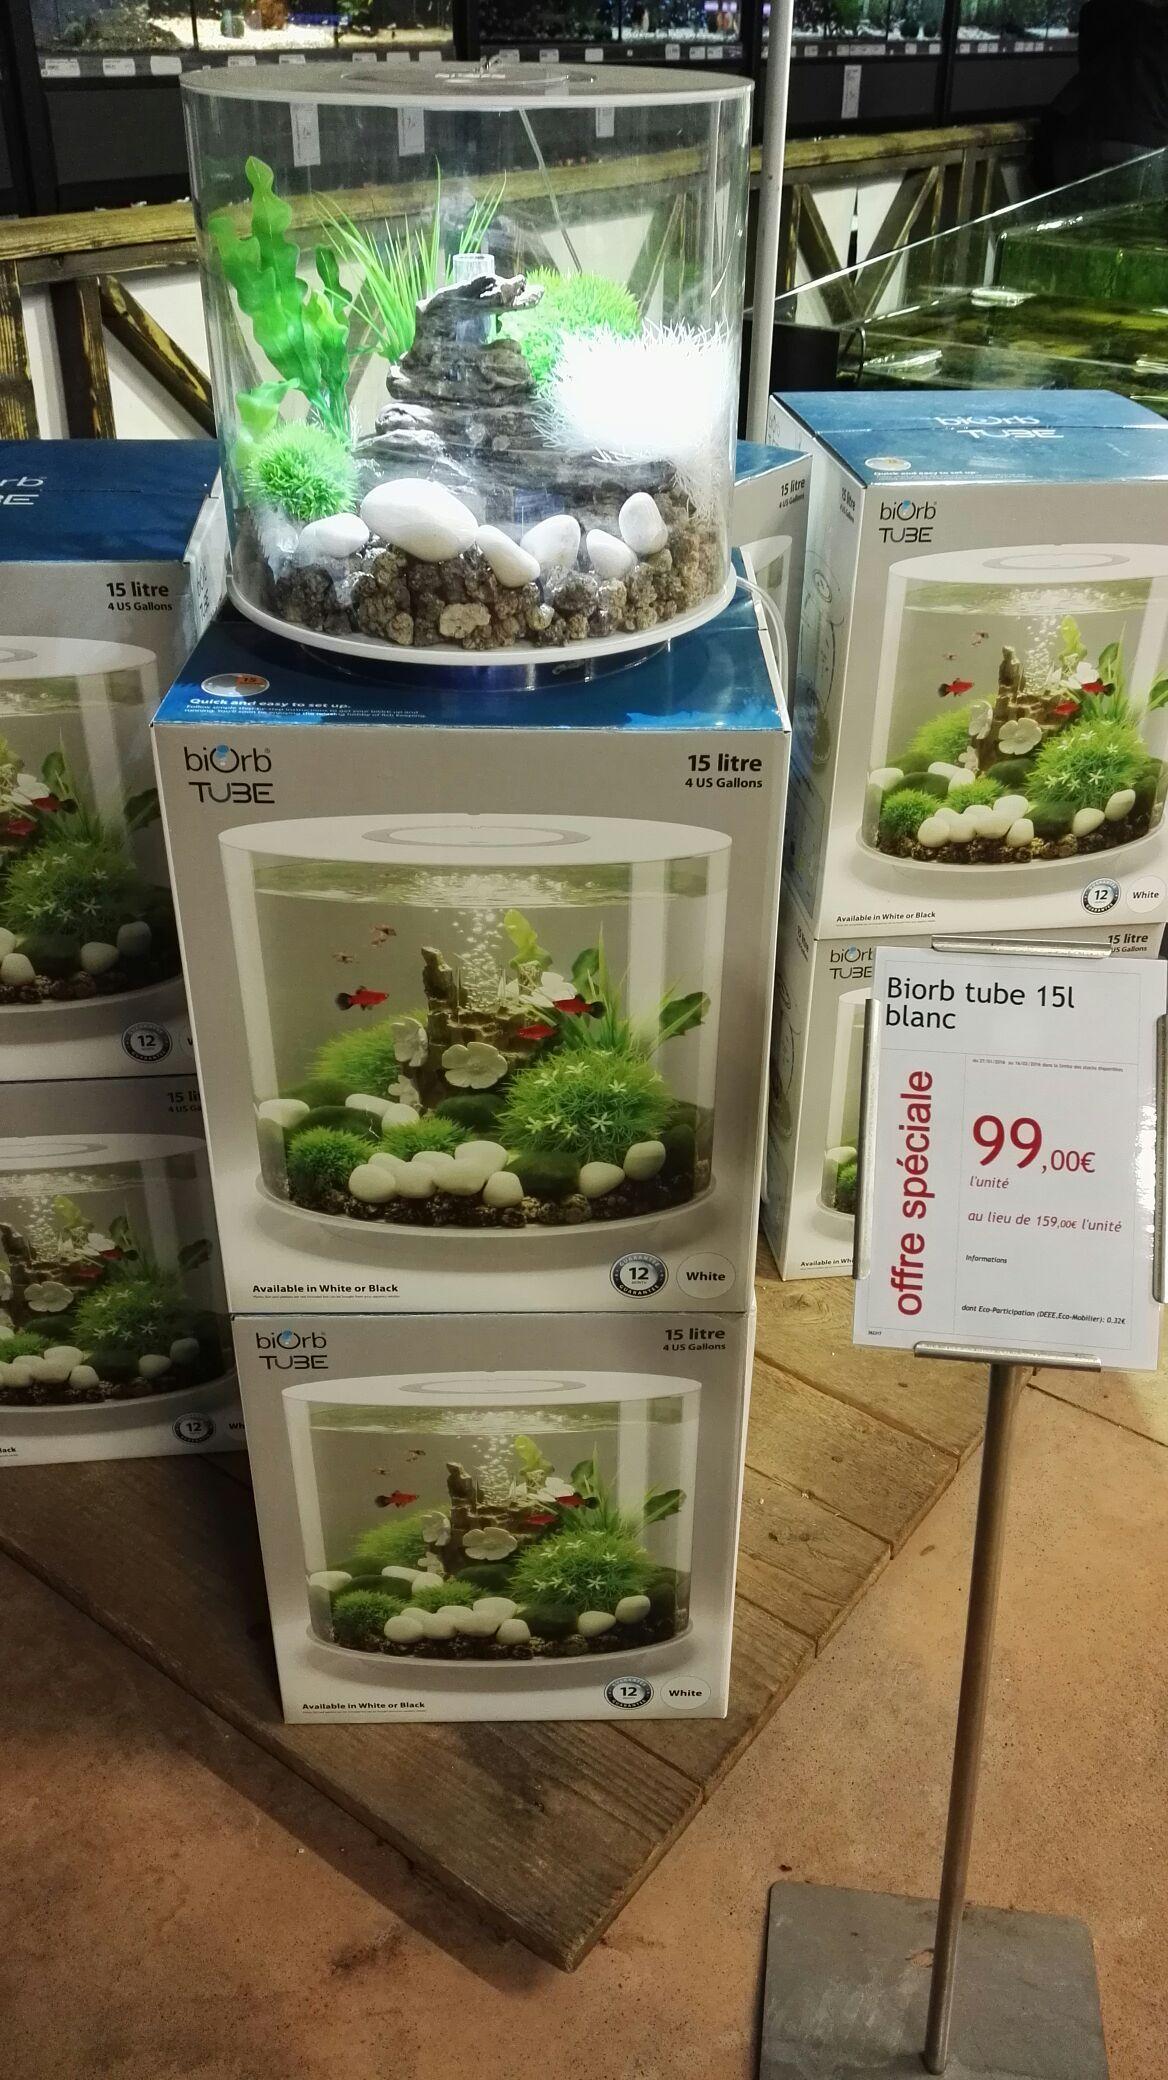 Aquarium Biorb 15L Blanc - Life à 69€, Tube